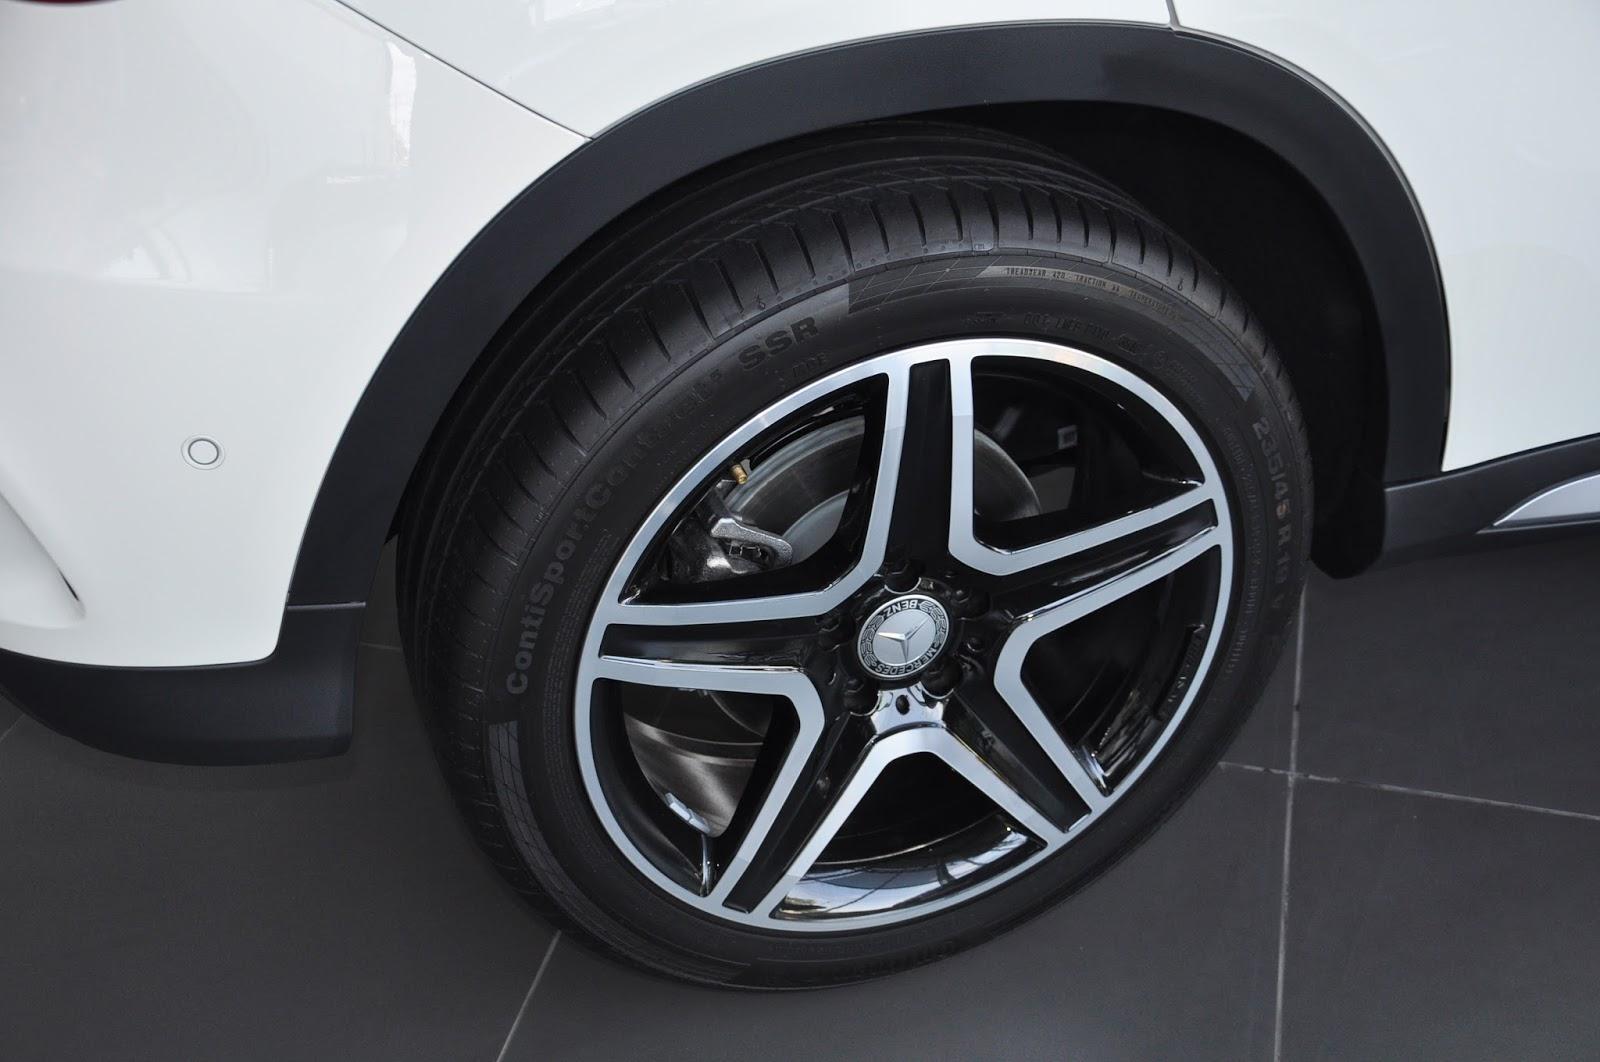 Xe Mercedes Benz GLA 250 4Matic màu trắng 06